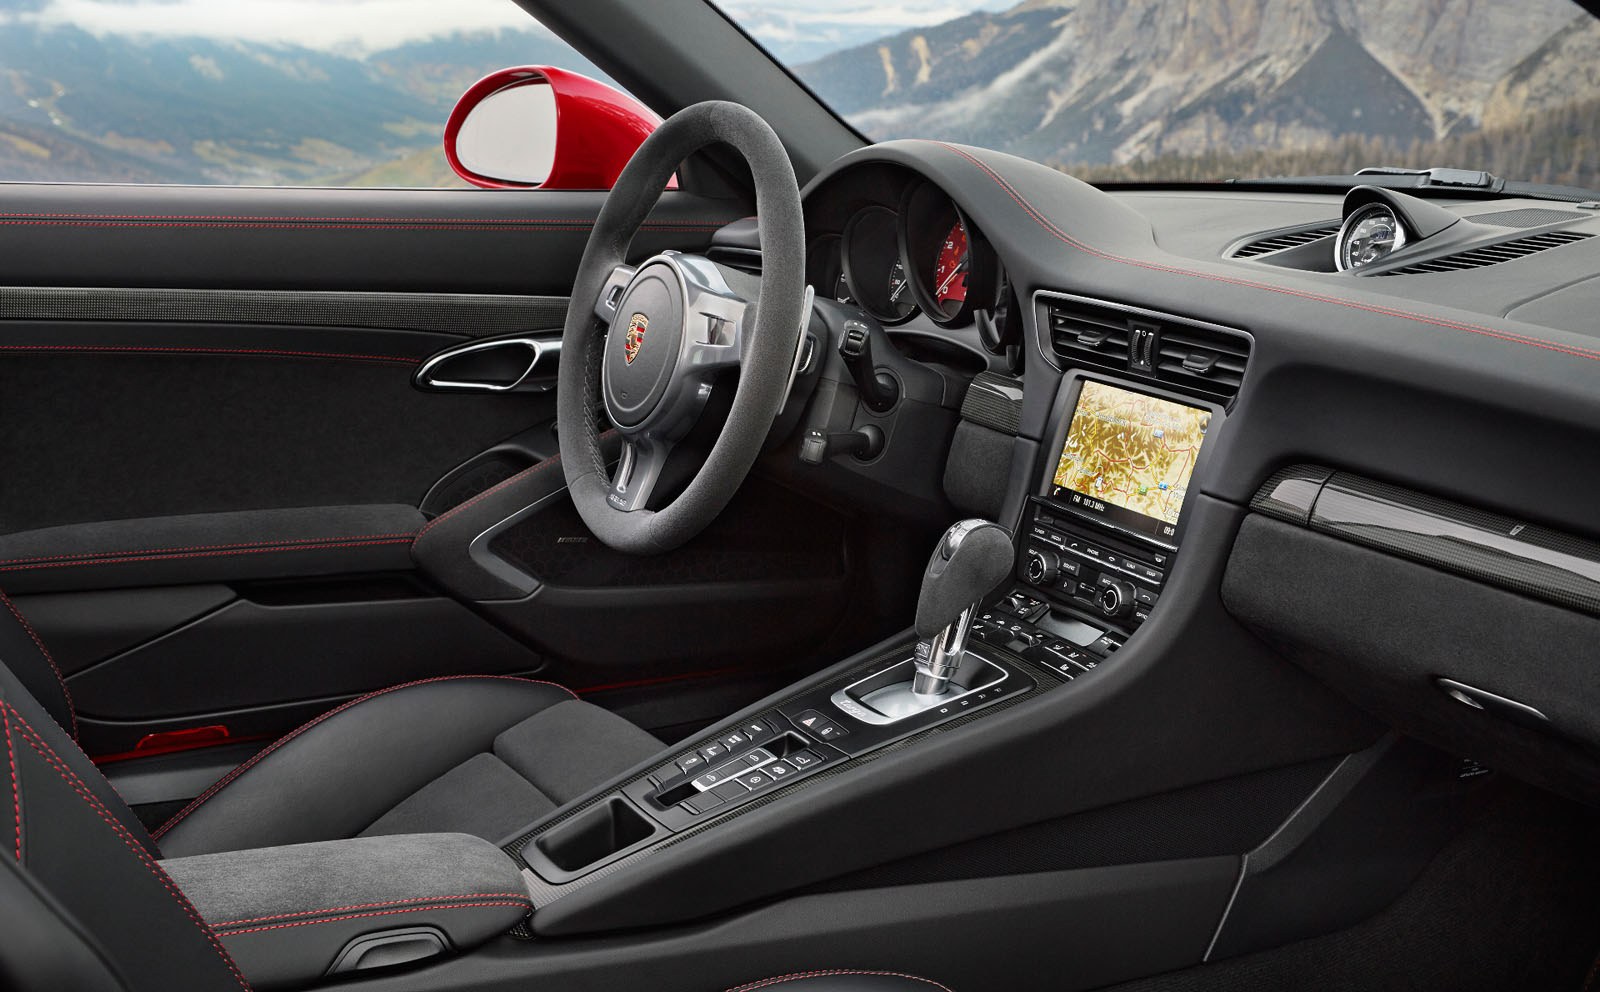 Porsche 911 targa 4 gts rendez vous en terre inconnue for Interieur porsche